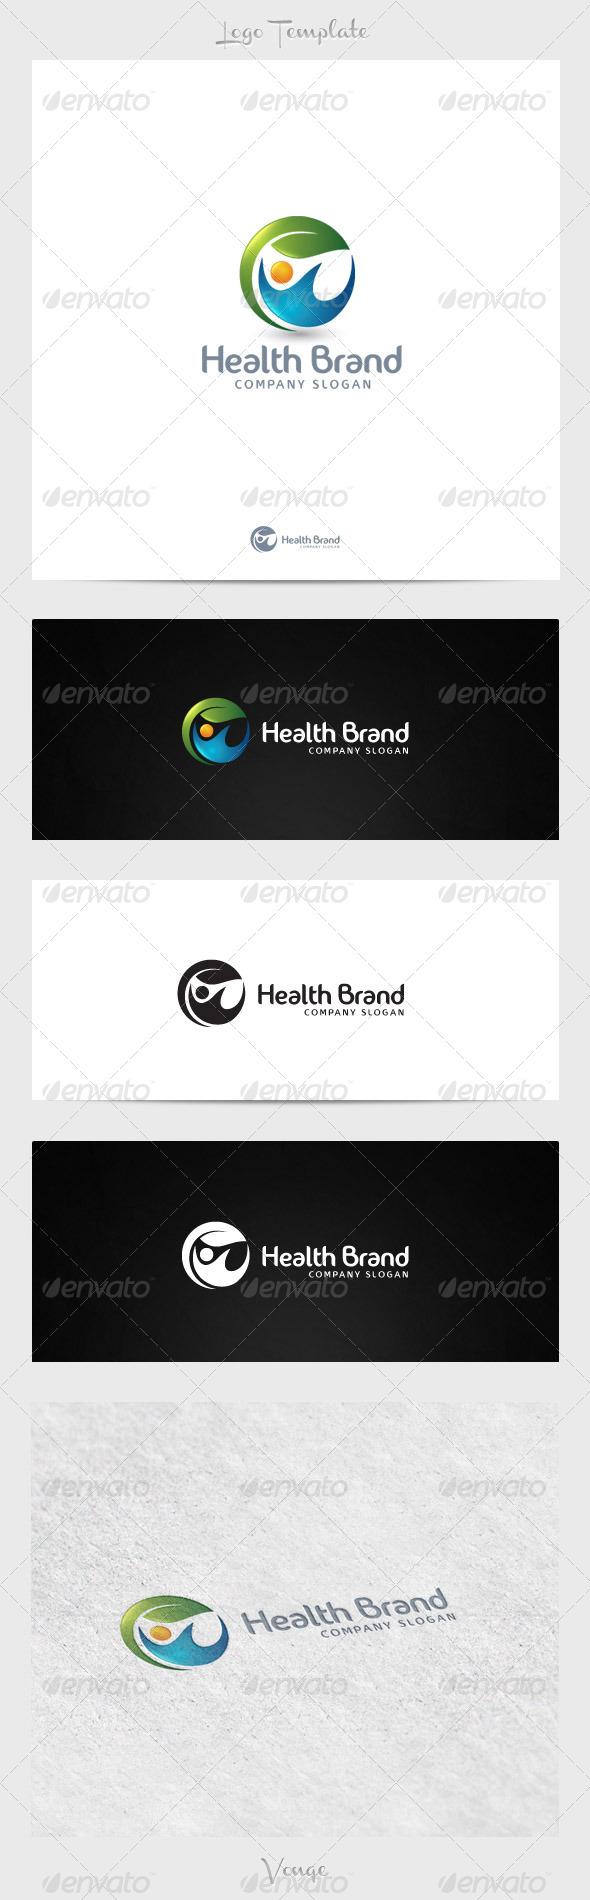 GraphicRiver The Health Brand 4224865